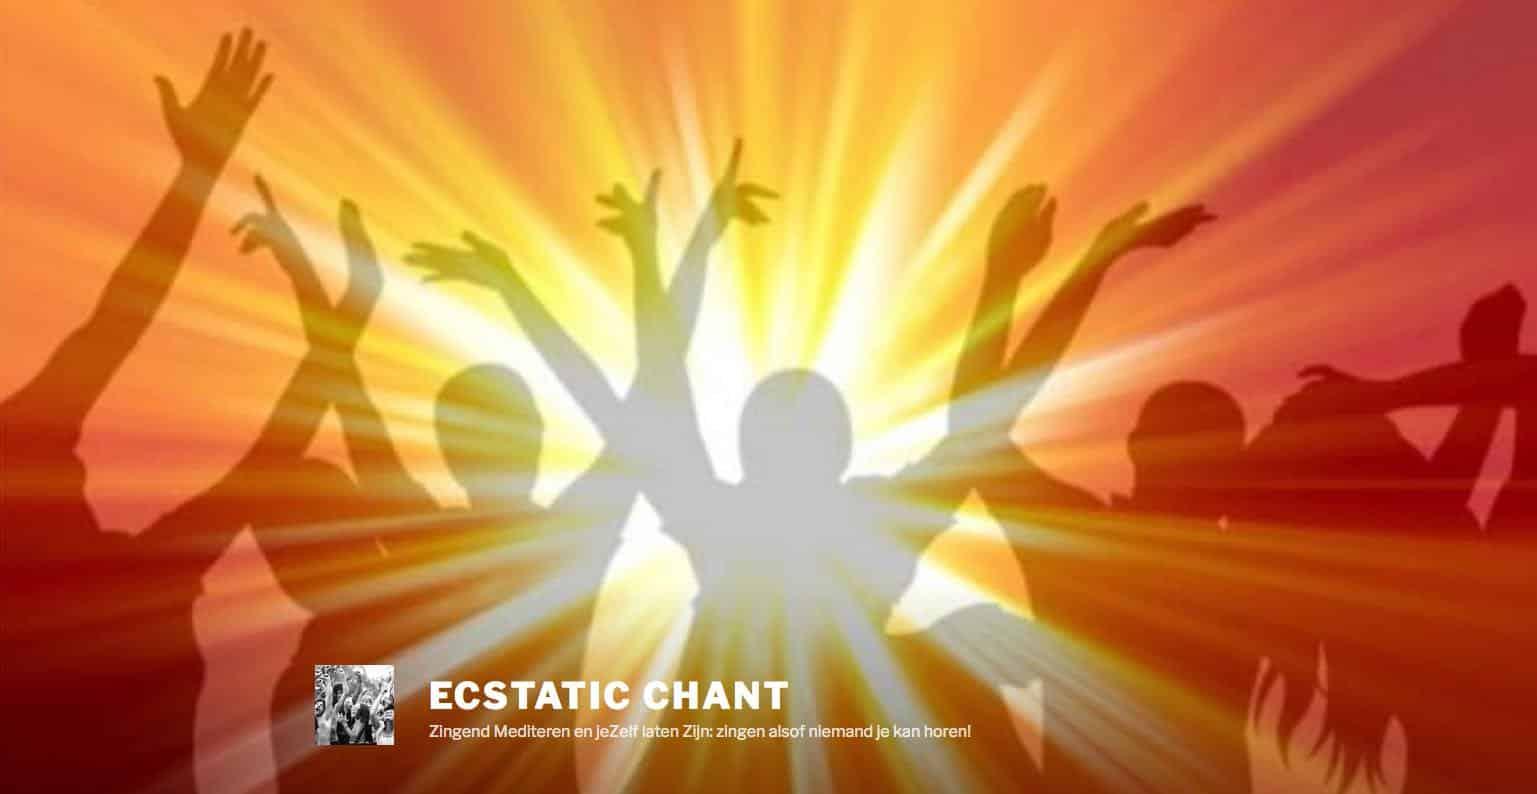 ecstaticchant.nl ecstatic chant